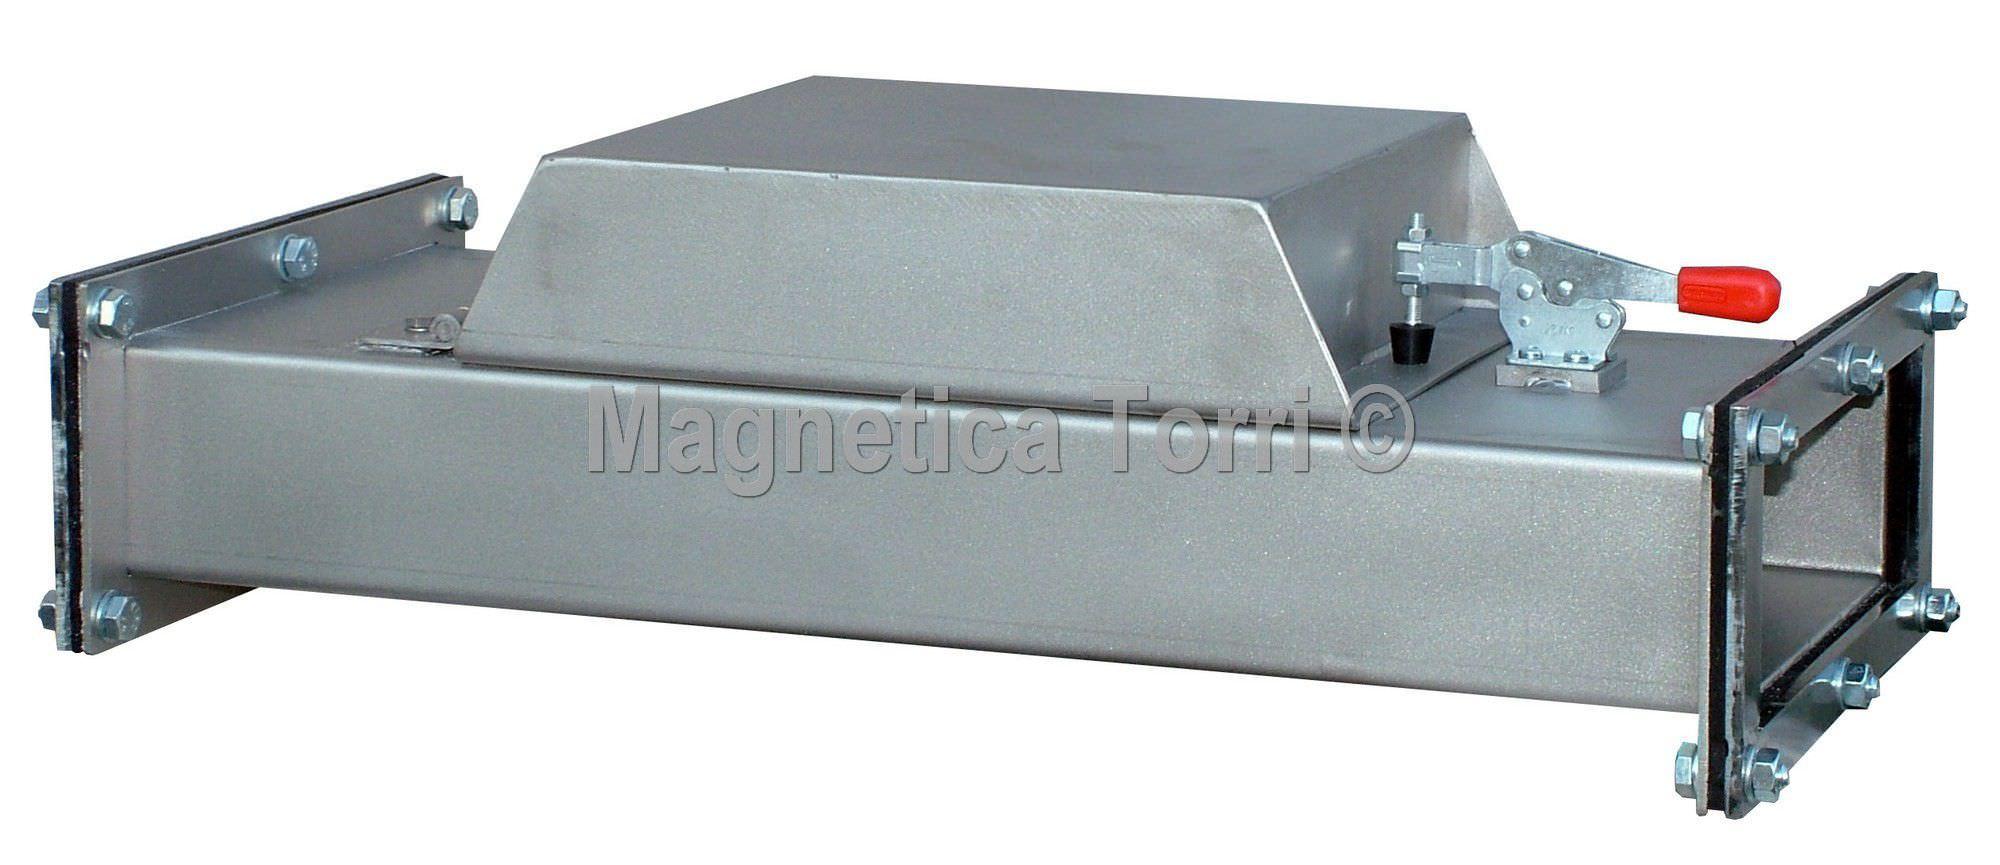 Magnetic tube separator tmx magnetica torri srl magnetic tube separator tmx magnetica torri srl publicscrutiny Choice Image